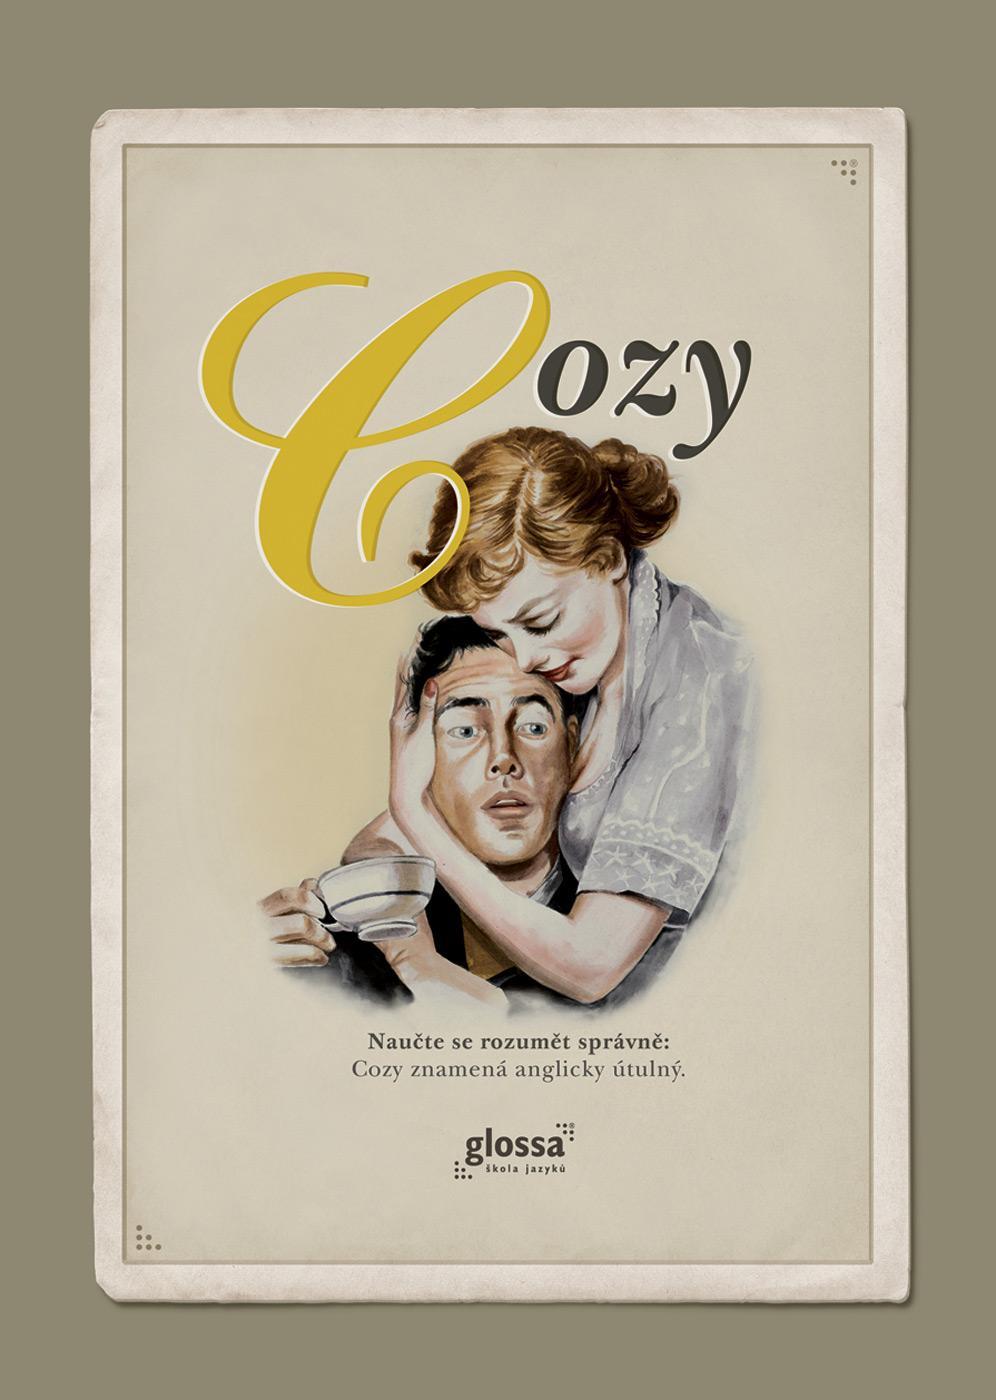 Glossa Print Ad -  Cozy